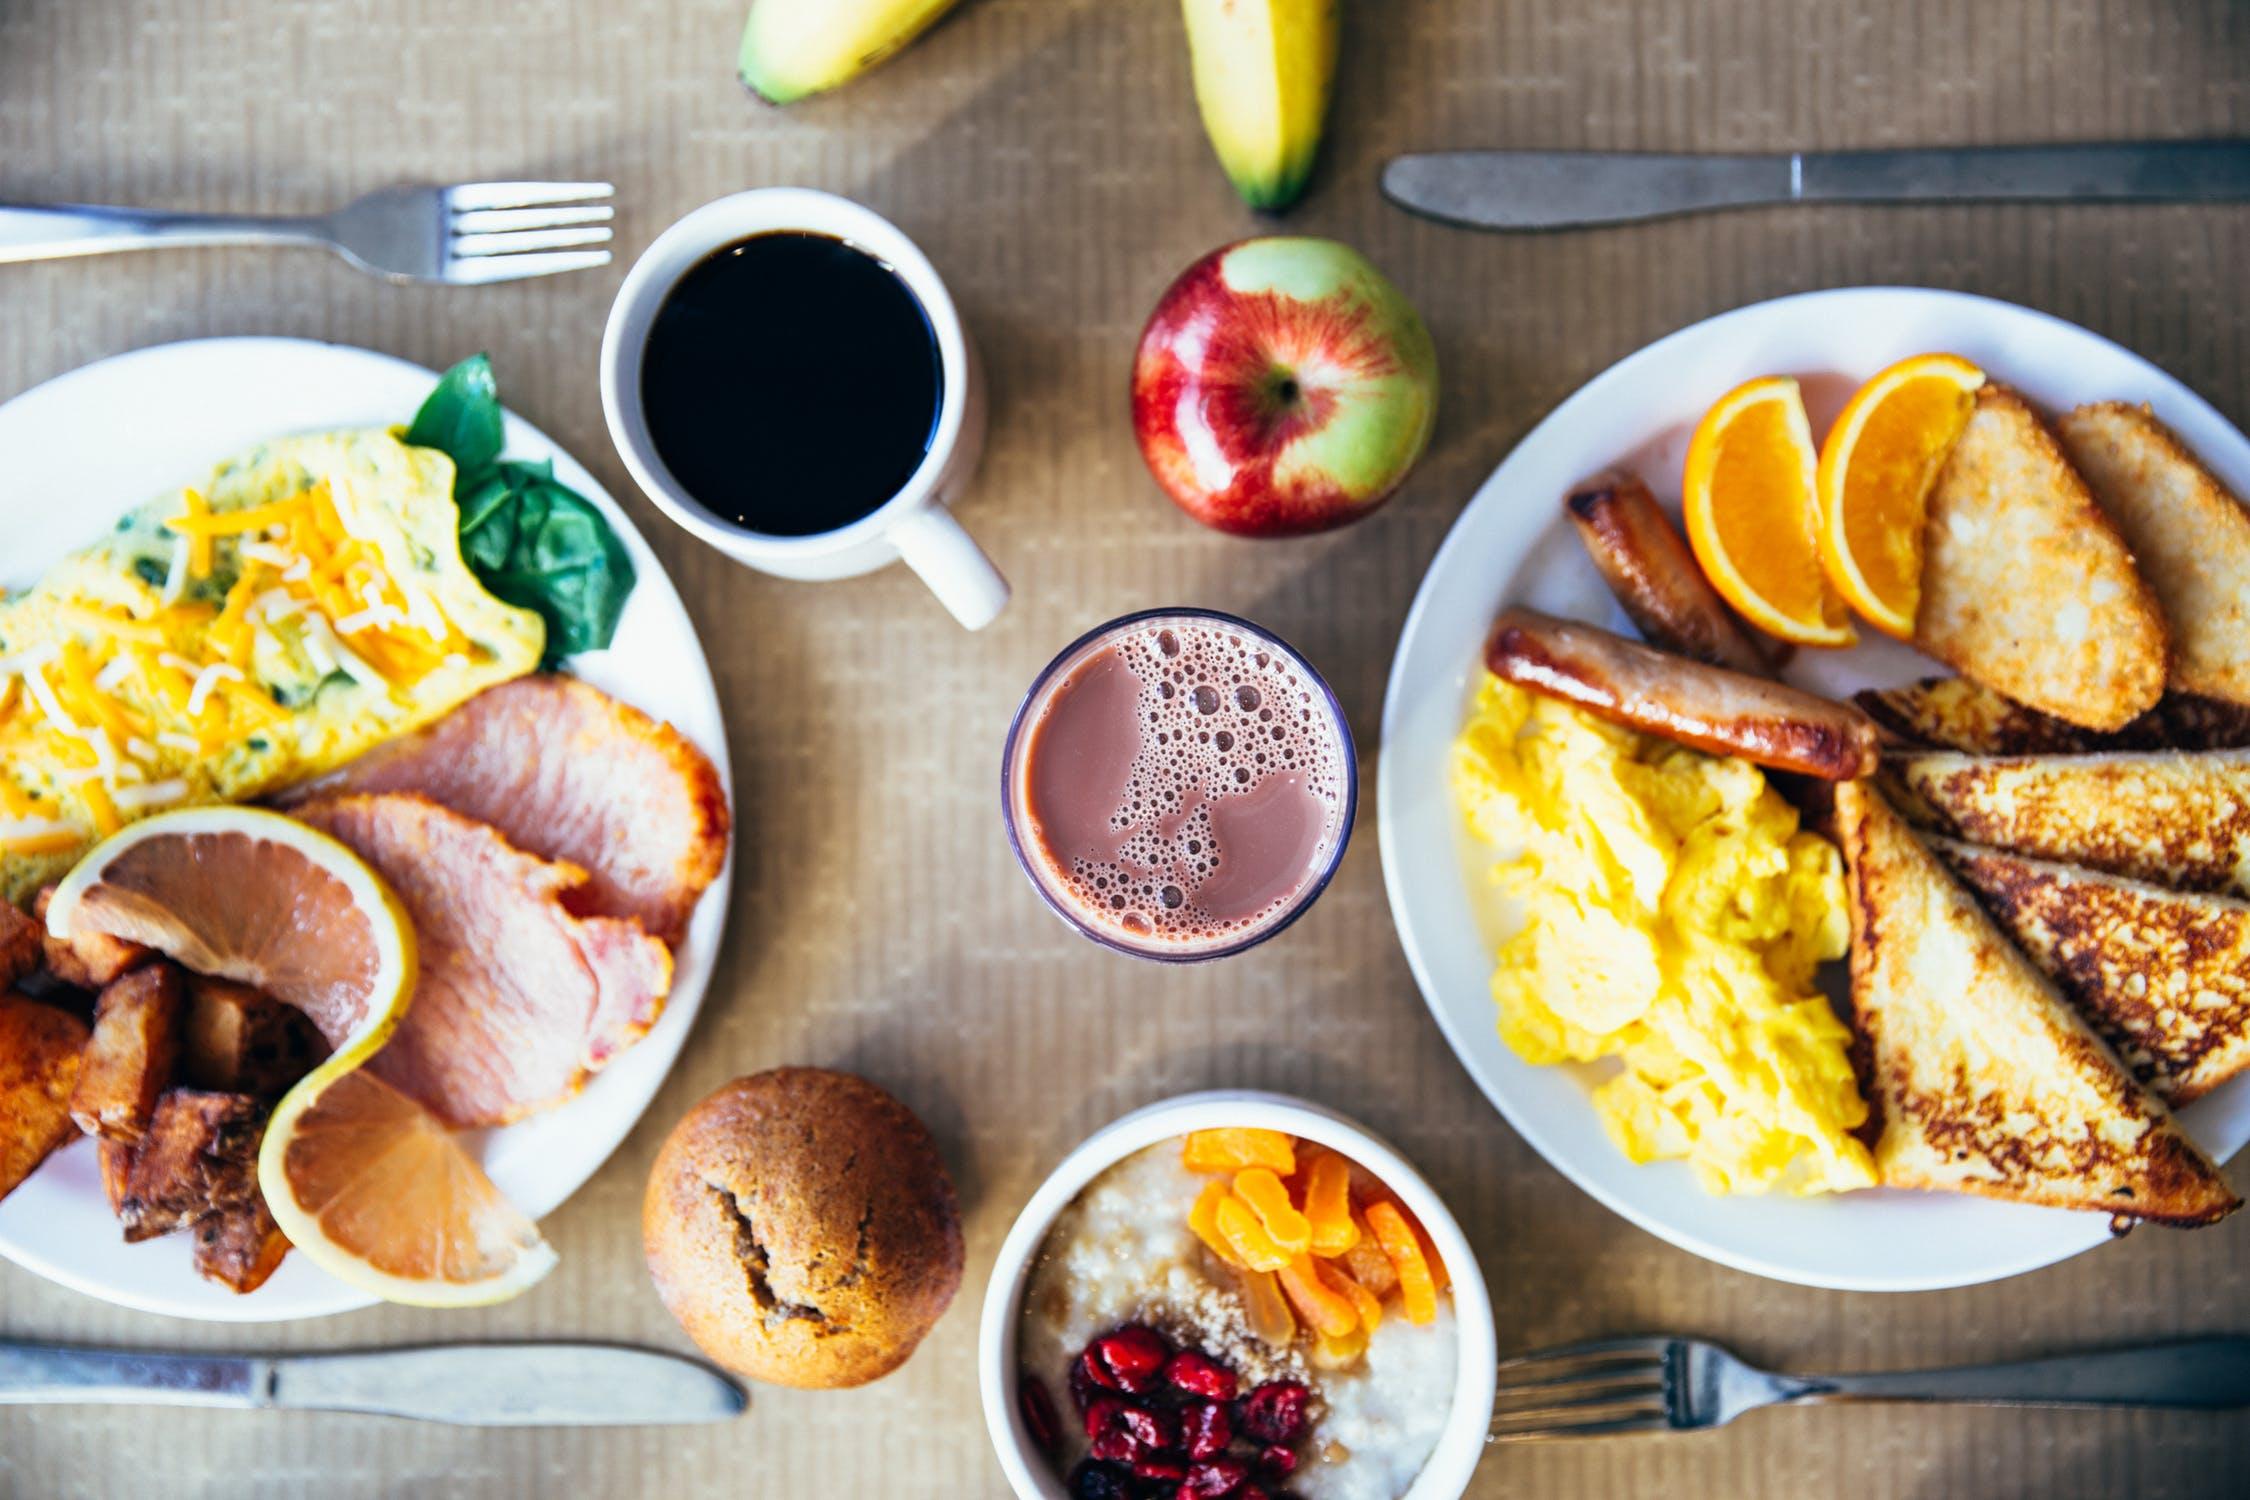 Goed bezig: we verspillen minder voedsel